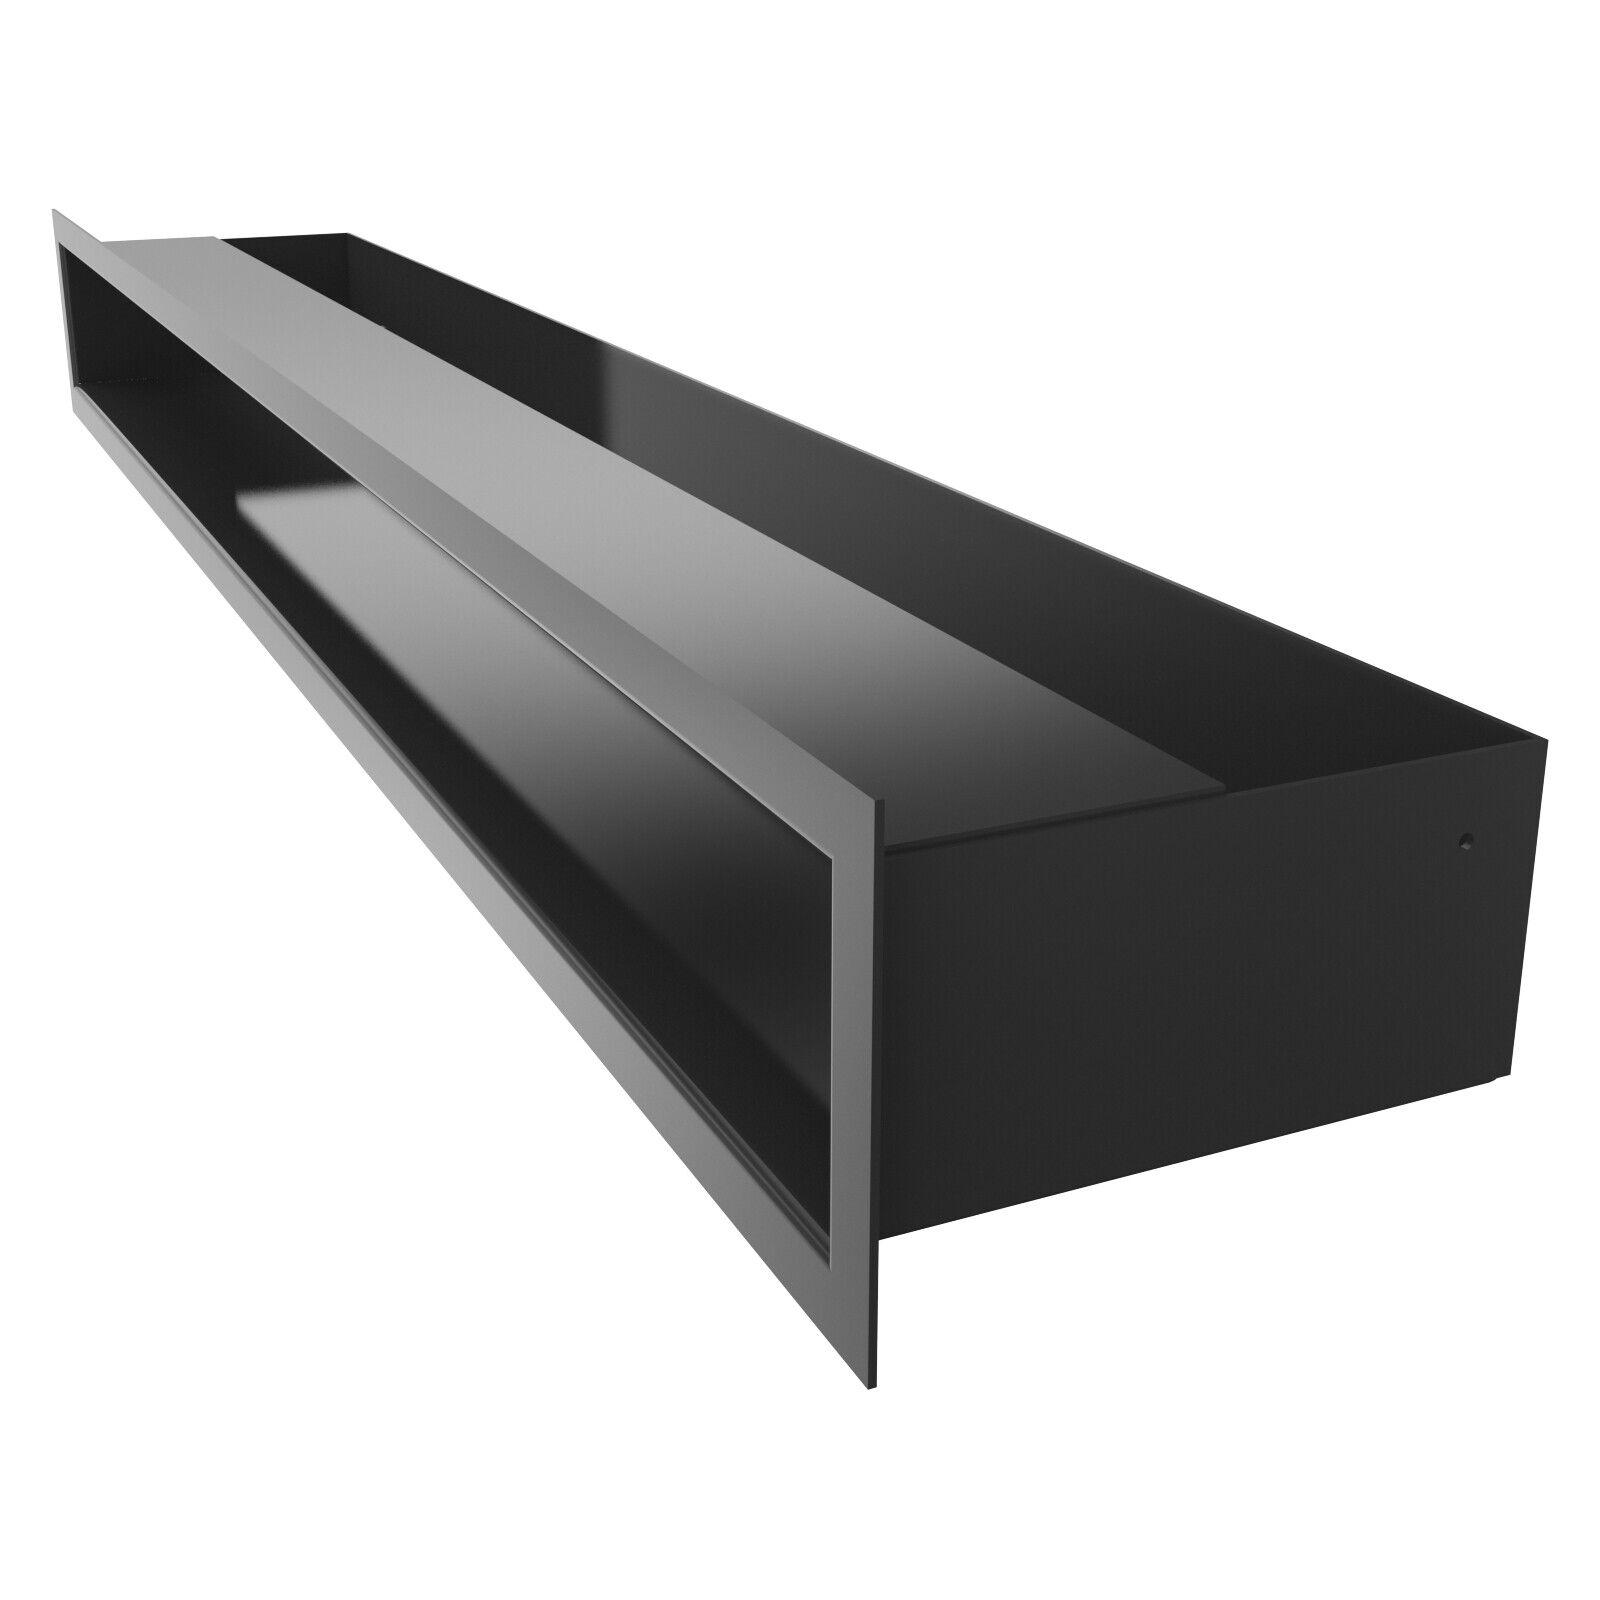 Luftleiste Ventilationsrahmen Lüftungsgitter Kamingitter schwarz 90x800 mm